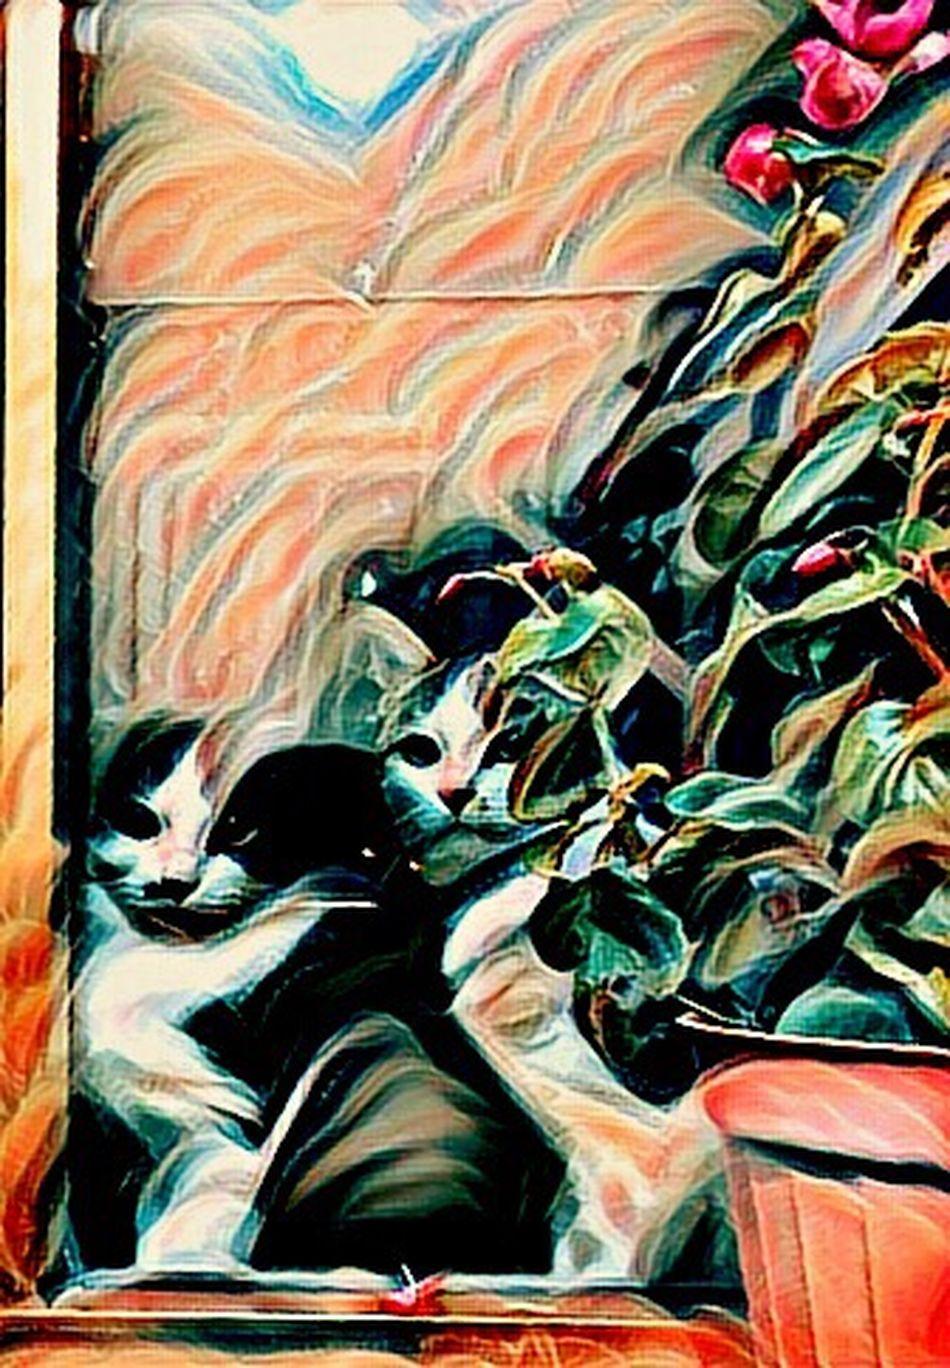 Multi Colored No People Low Angle View Indoors  Close-up Day Eyeemphoto Architecture EyeEm Best Shots EyeEm Gallery Relaxing Domestic Animals Catsofinstagram Cats Cat Pupsofinstagram Pups Puppy EyeEm Best Edits Hello World Kurtdere SARAY TEKİRDAĞ